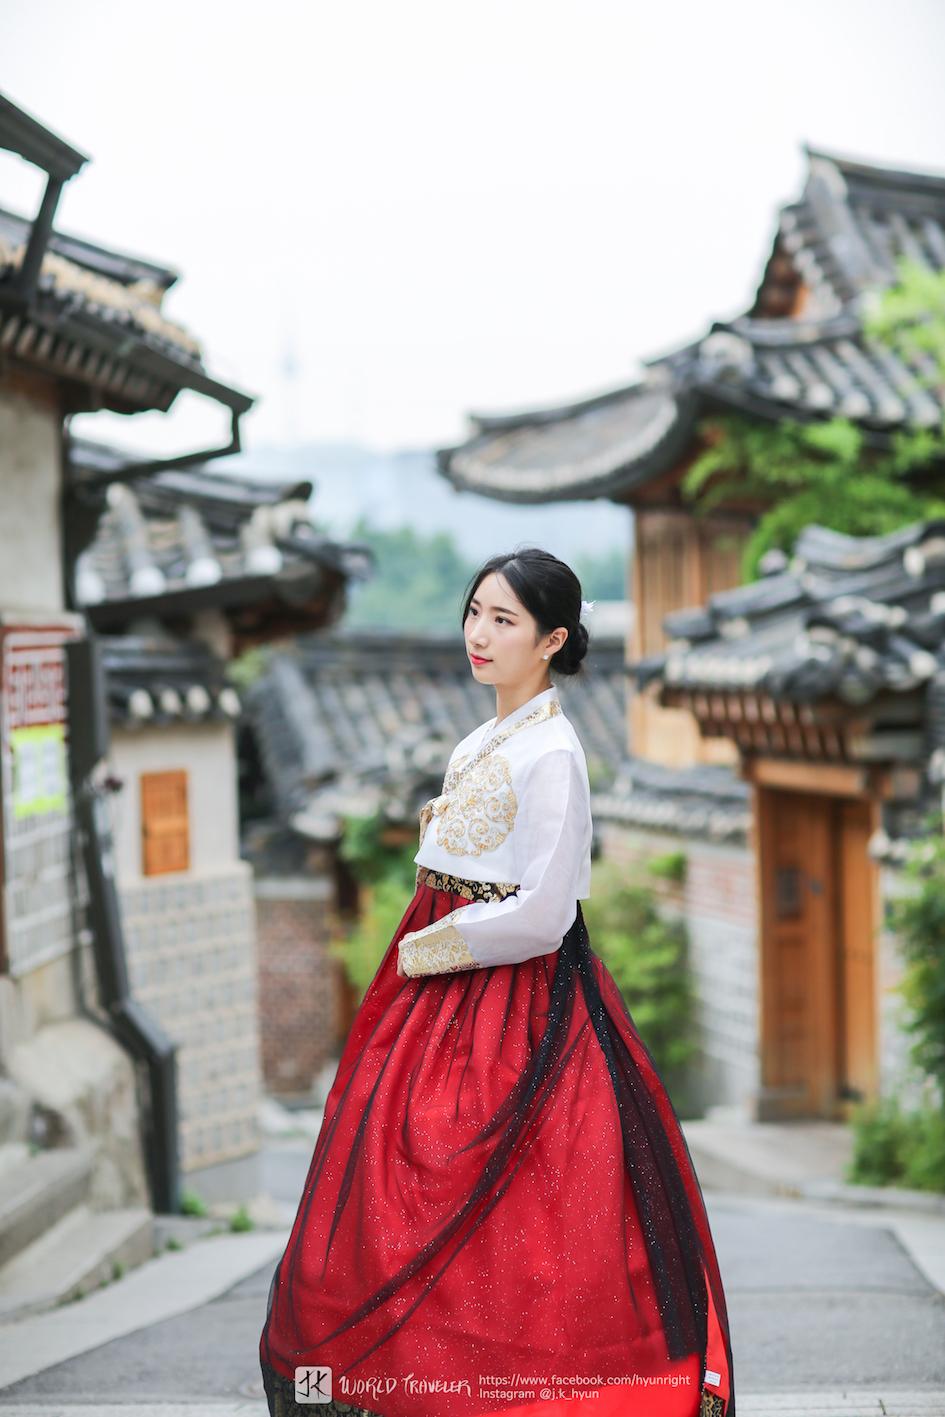 Sprazzi_Professional_Photography_Photographer_Seoul_Korea_Jaekwang_Original_45.jpg